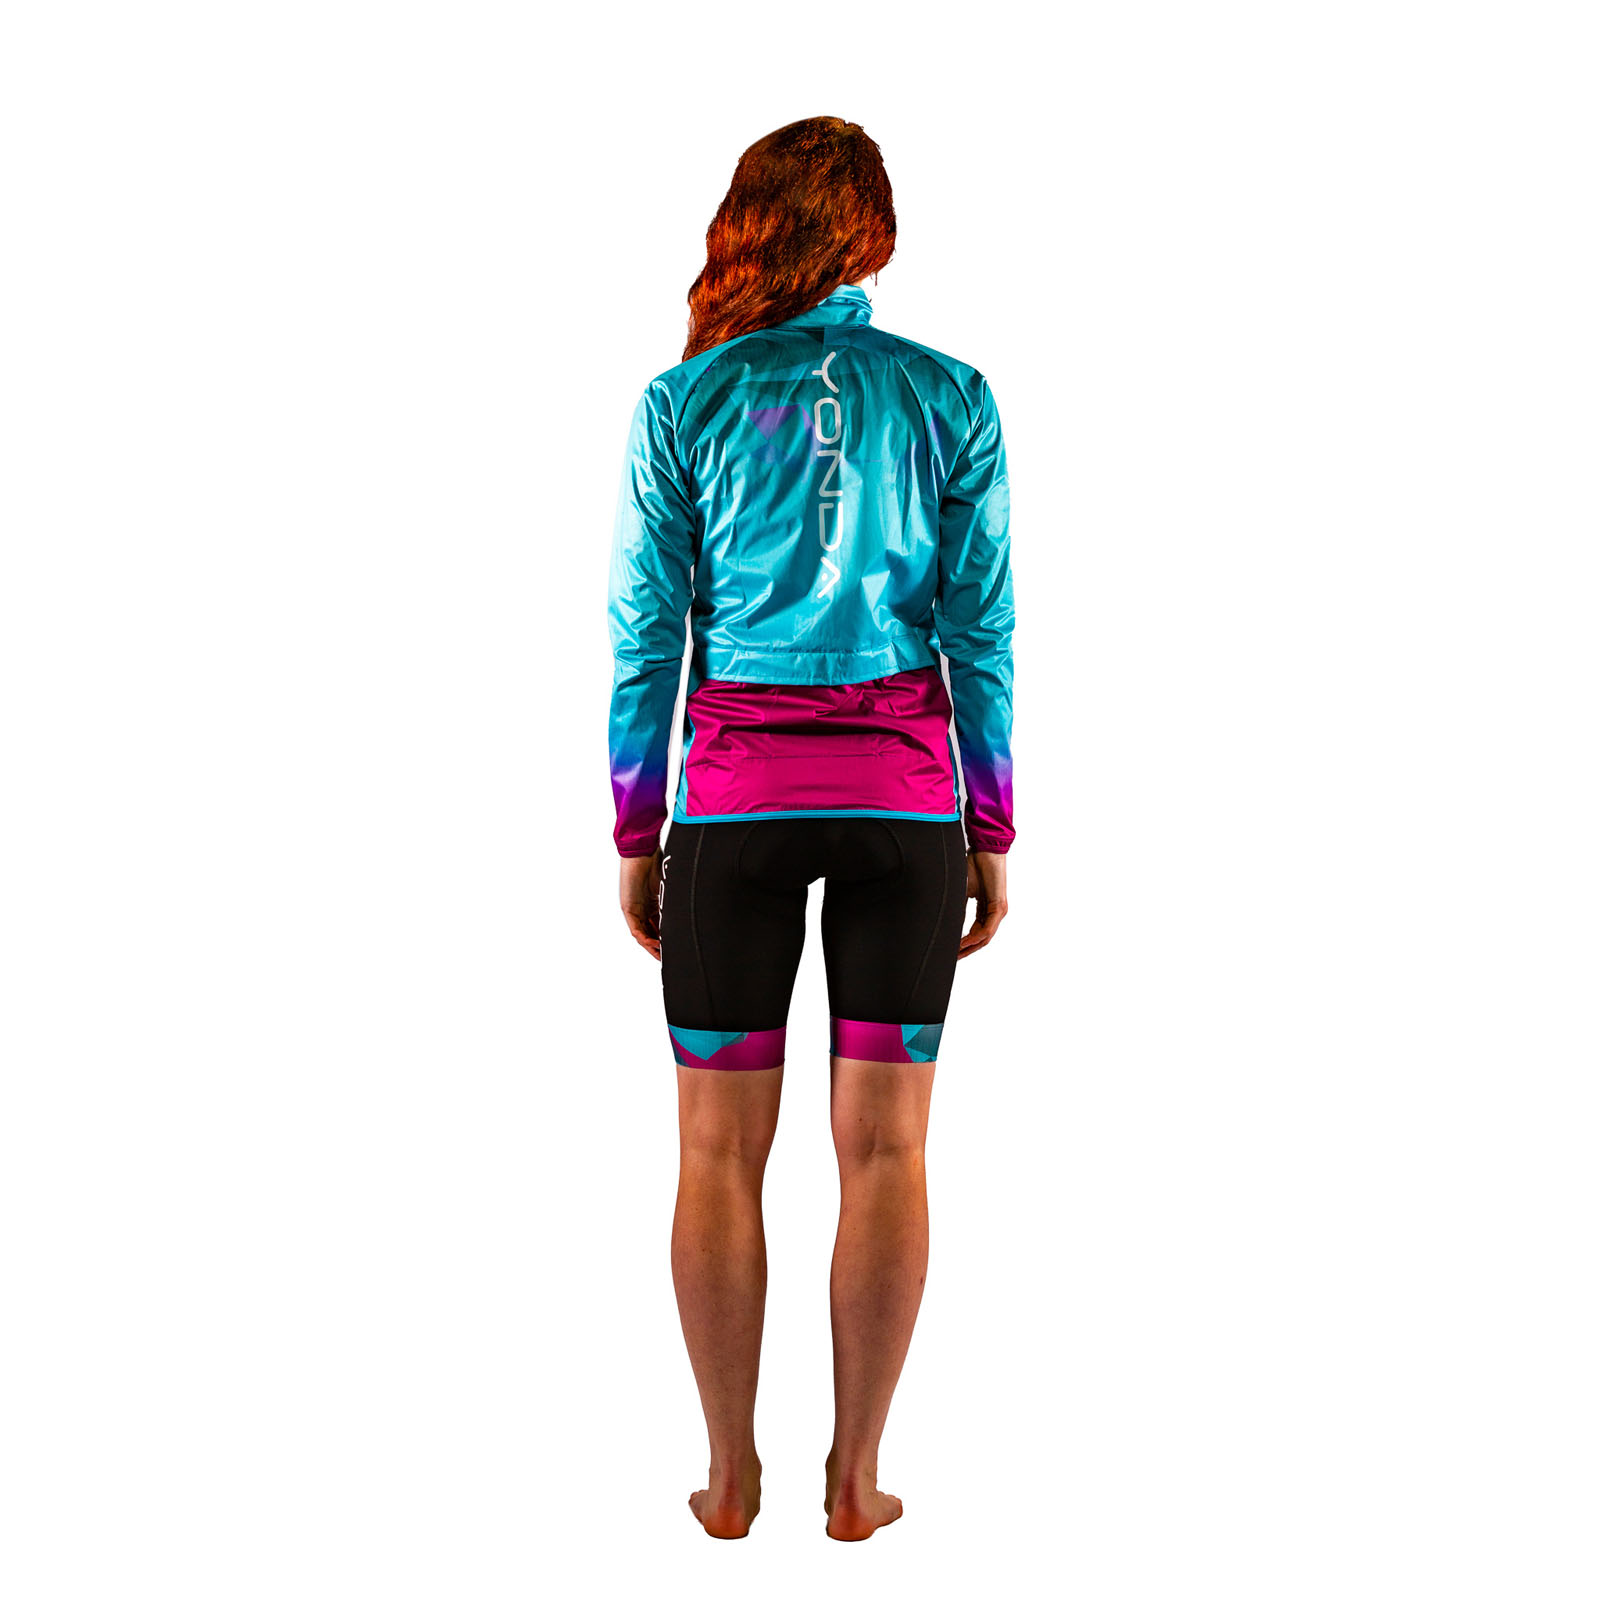 Astratto Blu Multi Sport Jacket – Women's